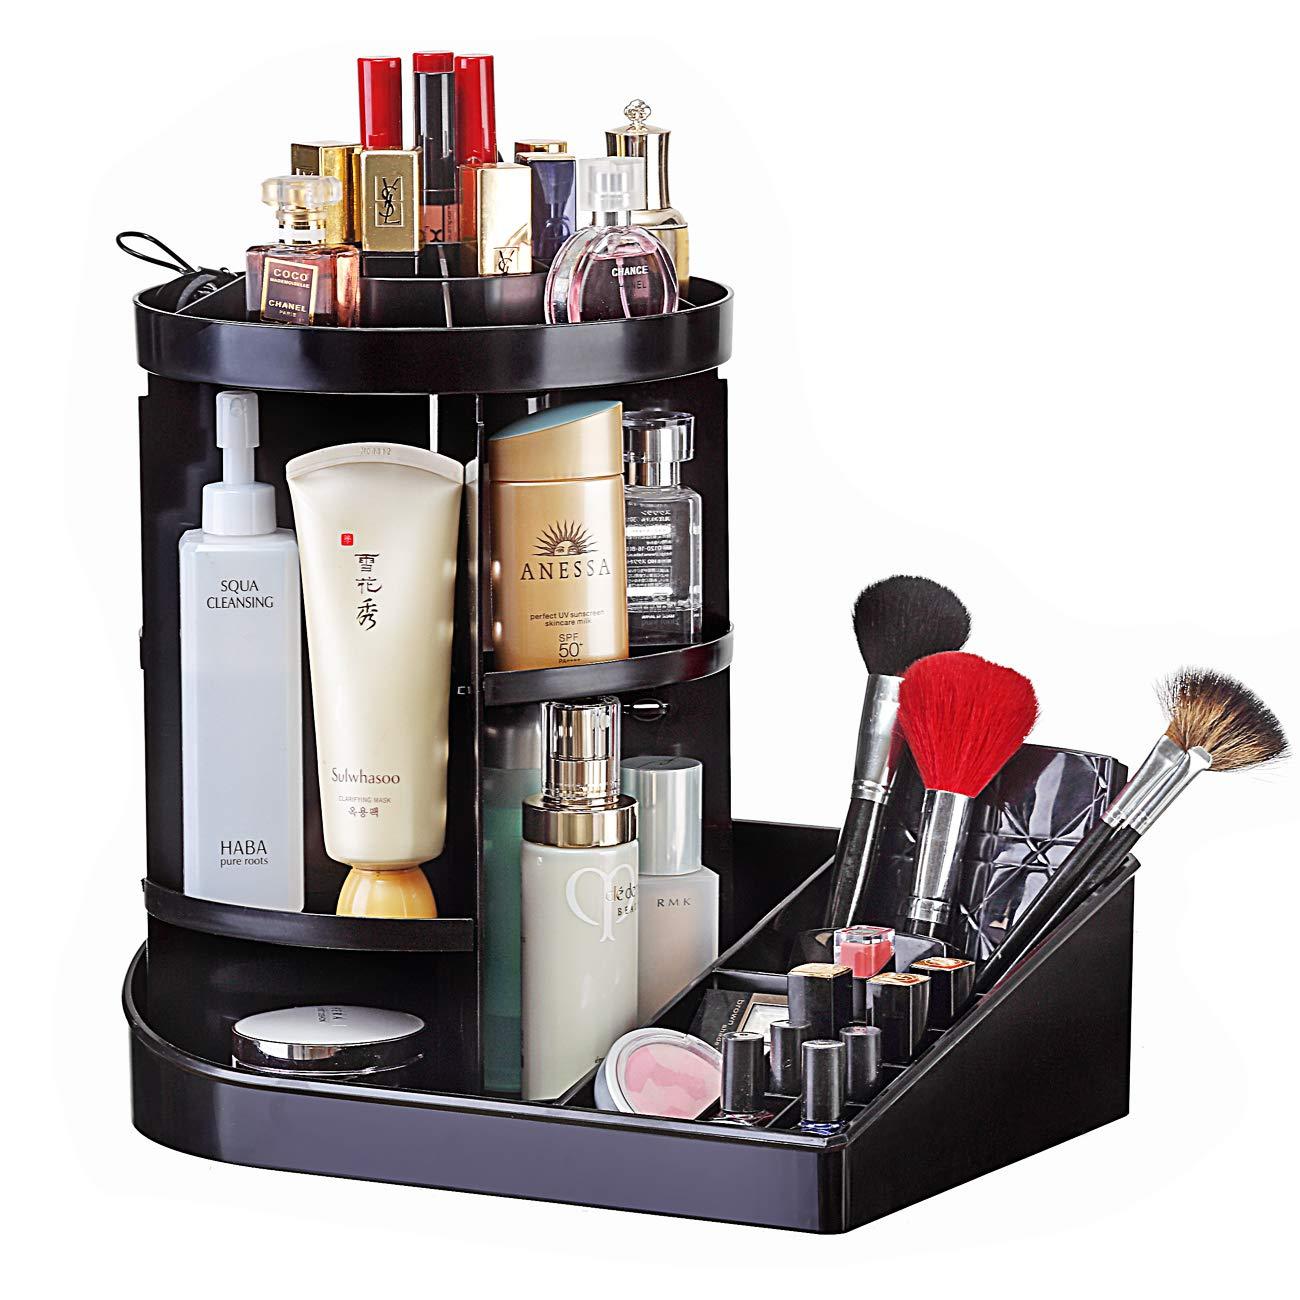 Ogrmar Adjustable 360 Degree Rotating Makeup Organizer Tray Large Capacity Cosmetics Carousel Spinning Holder Storage Rack Fits Toner, Creams, Makeup Brushes, Lipsticks More Black